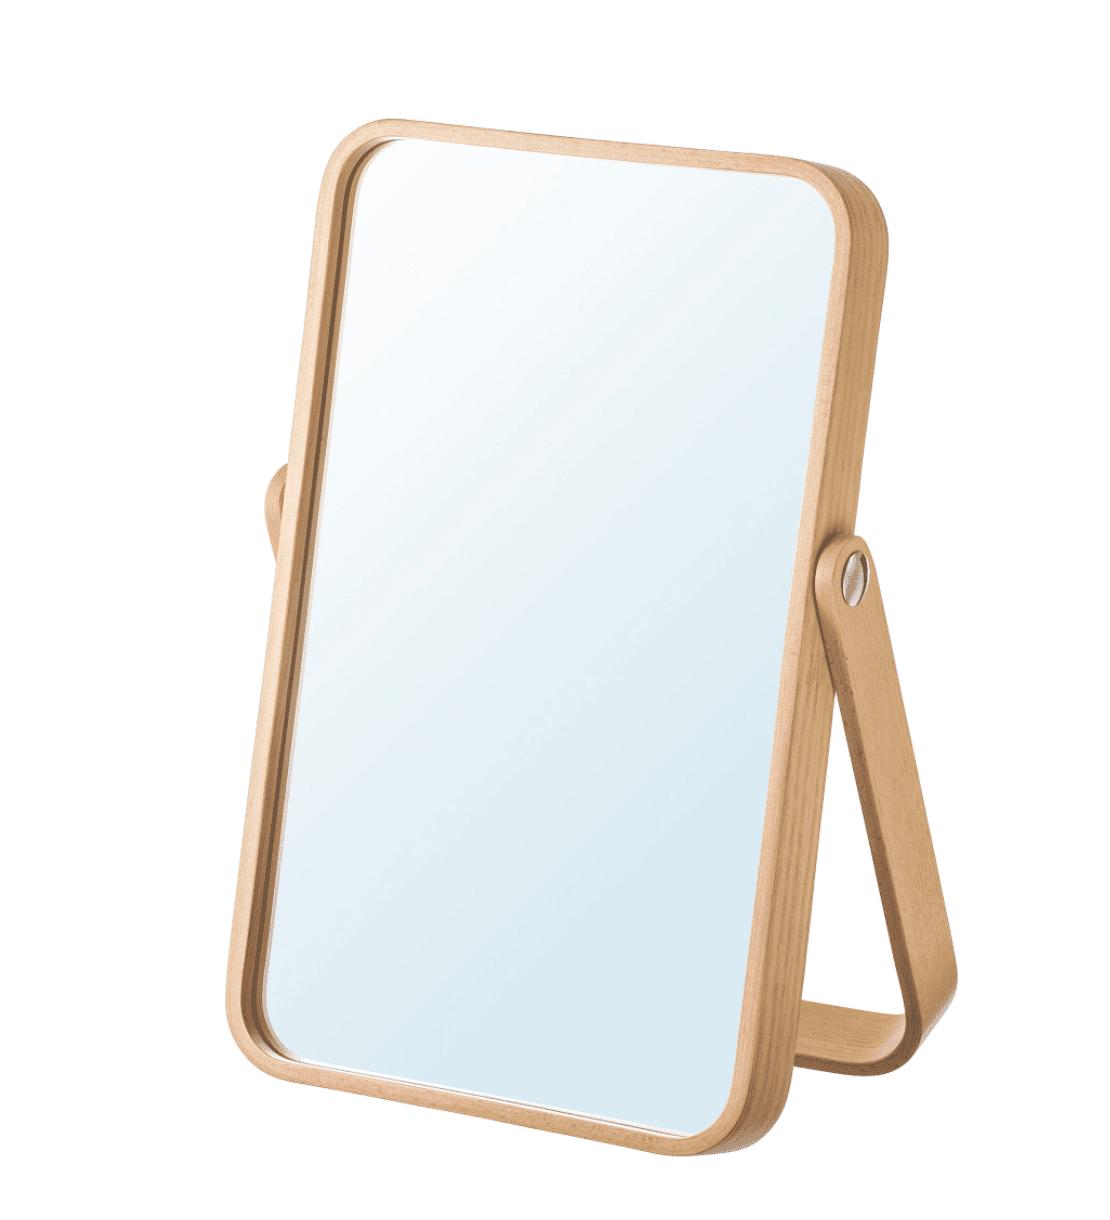 Ikorness table mirror